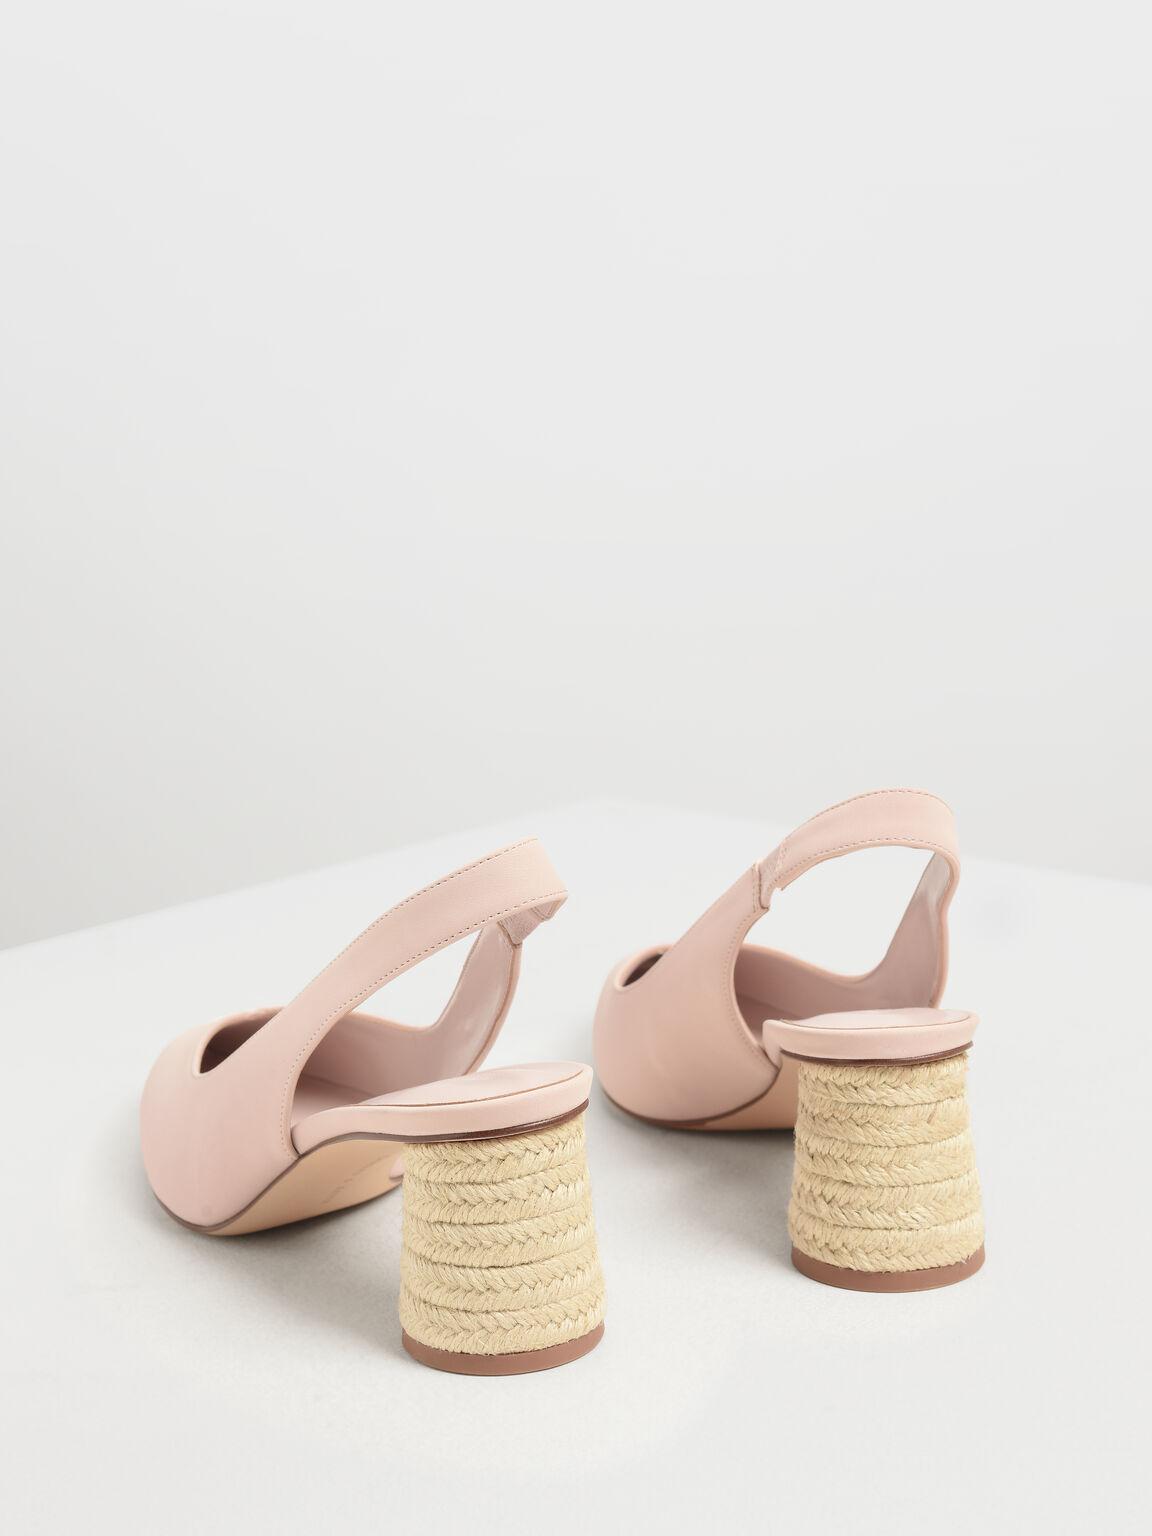 Cylindrical Espadrille Block Heel Slingbacks, Pink, hi-res